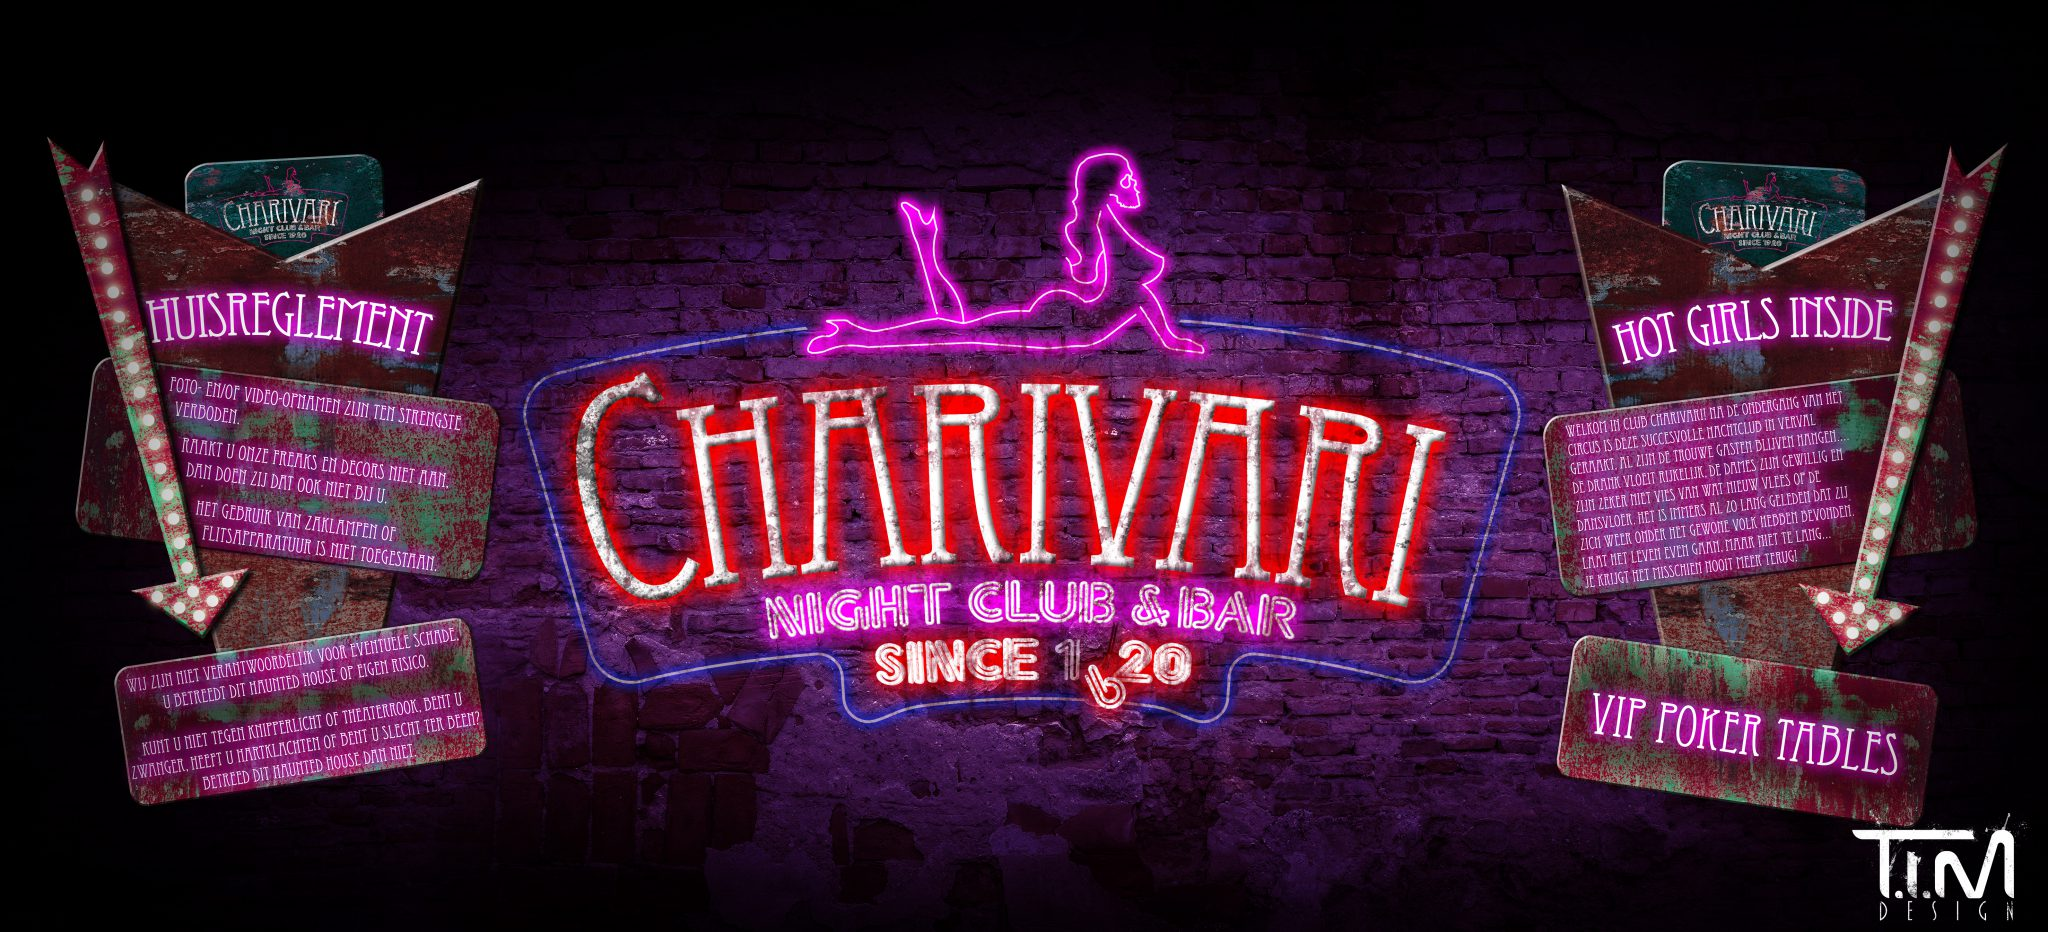 Club Charivari